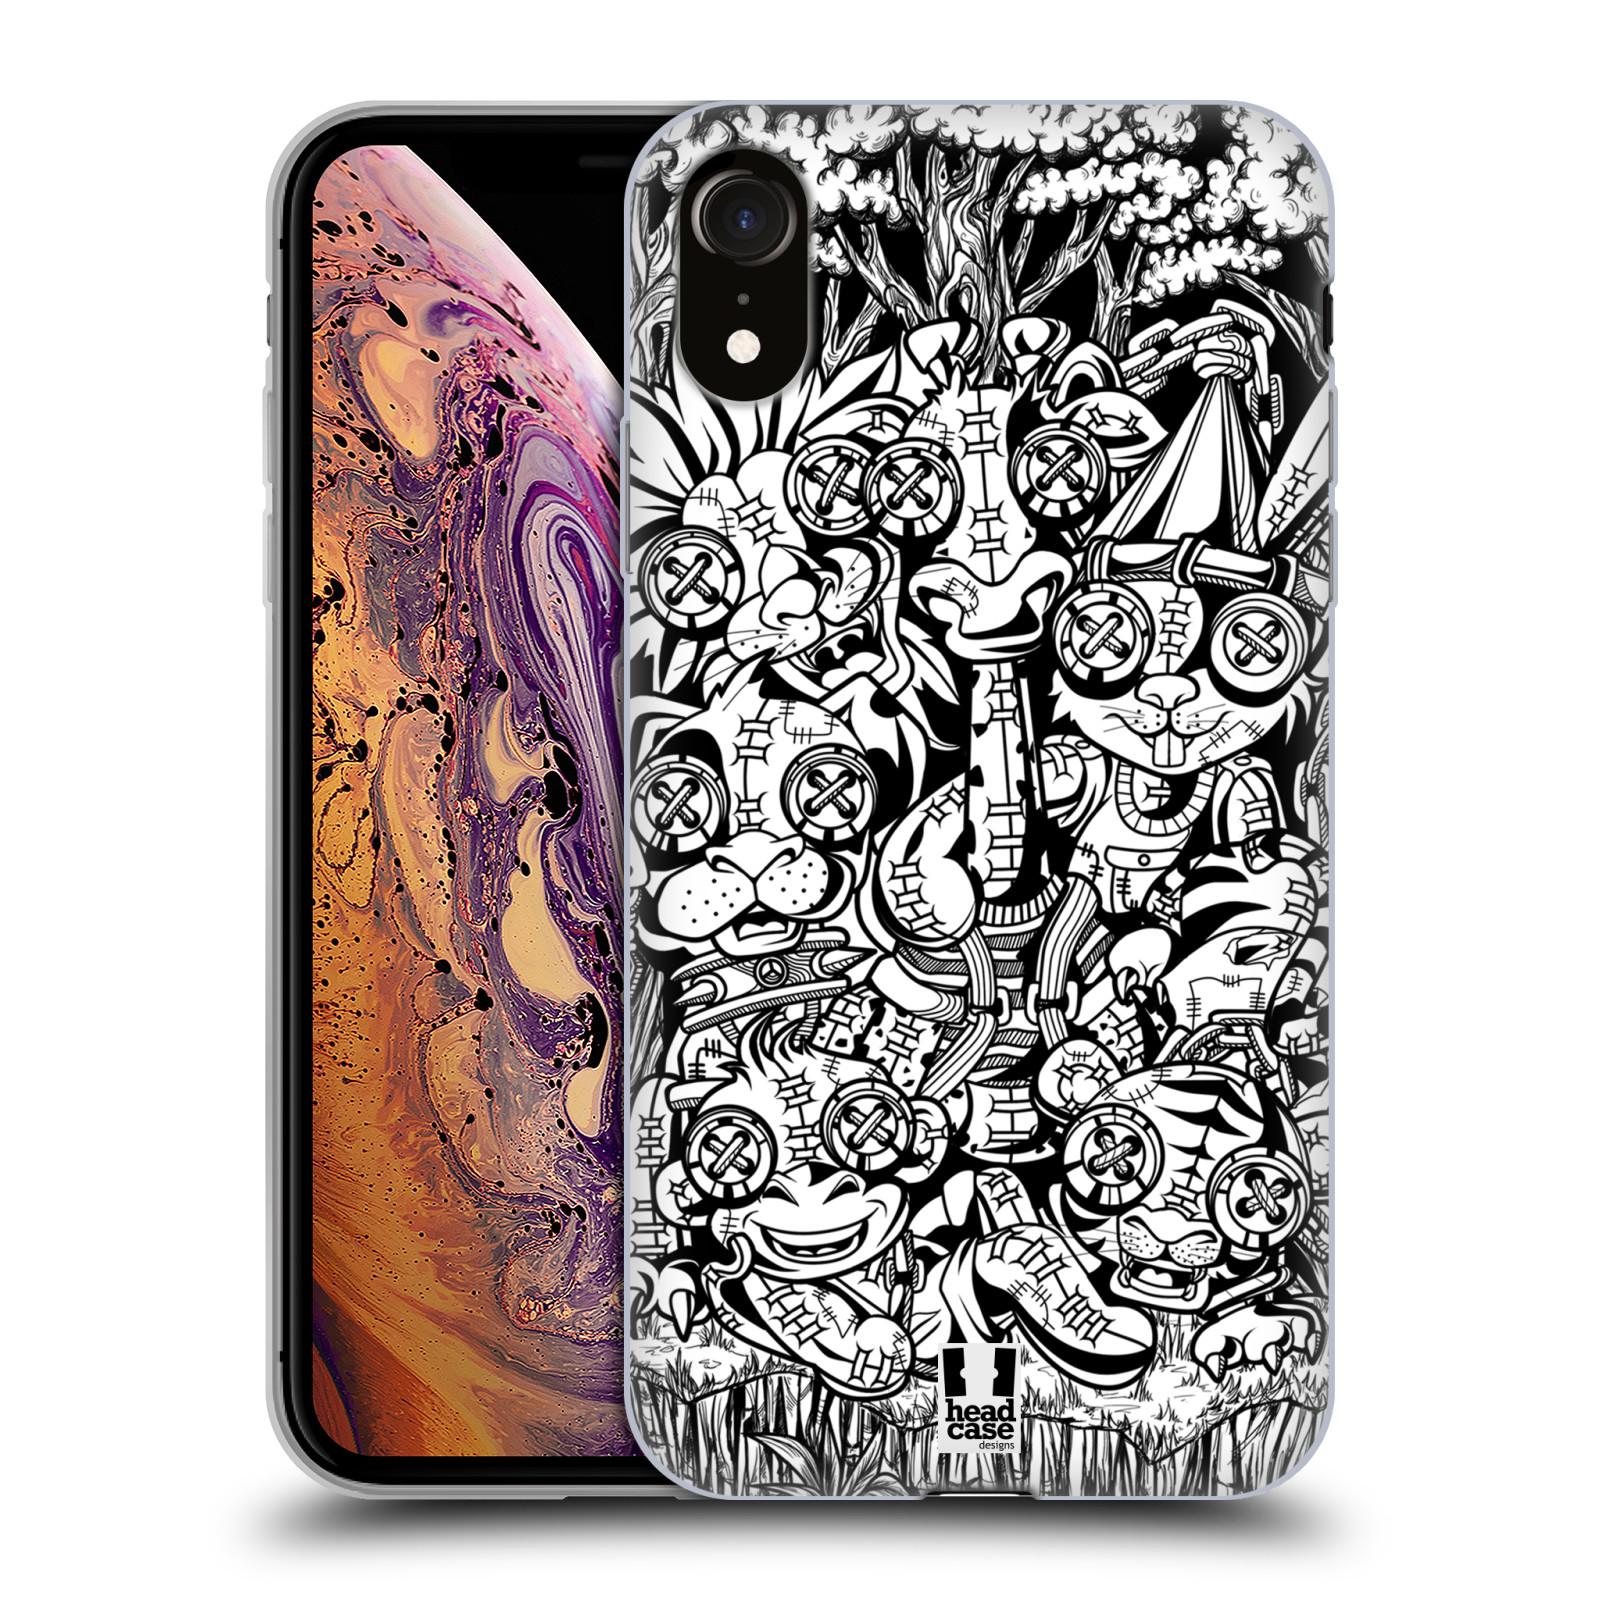 Silikonové pouzdro na mobil Apple iPhone XR - Head Case - VOODOO ZVÍŘÁTKA